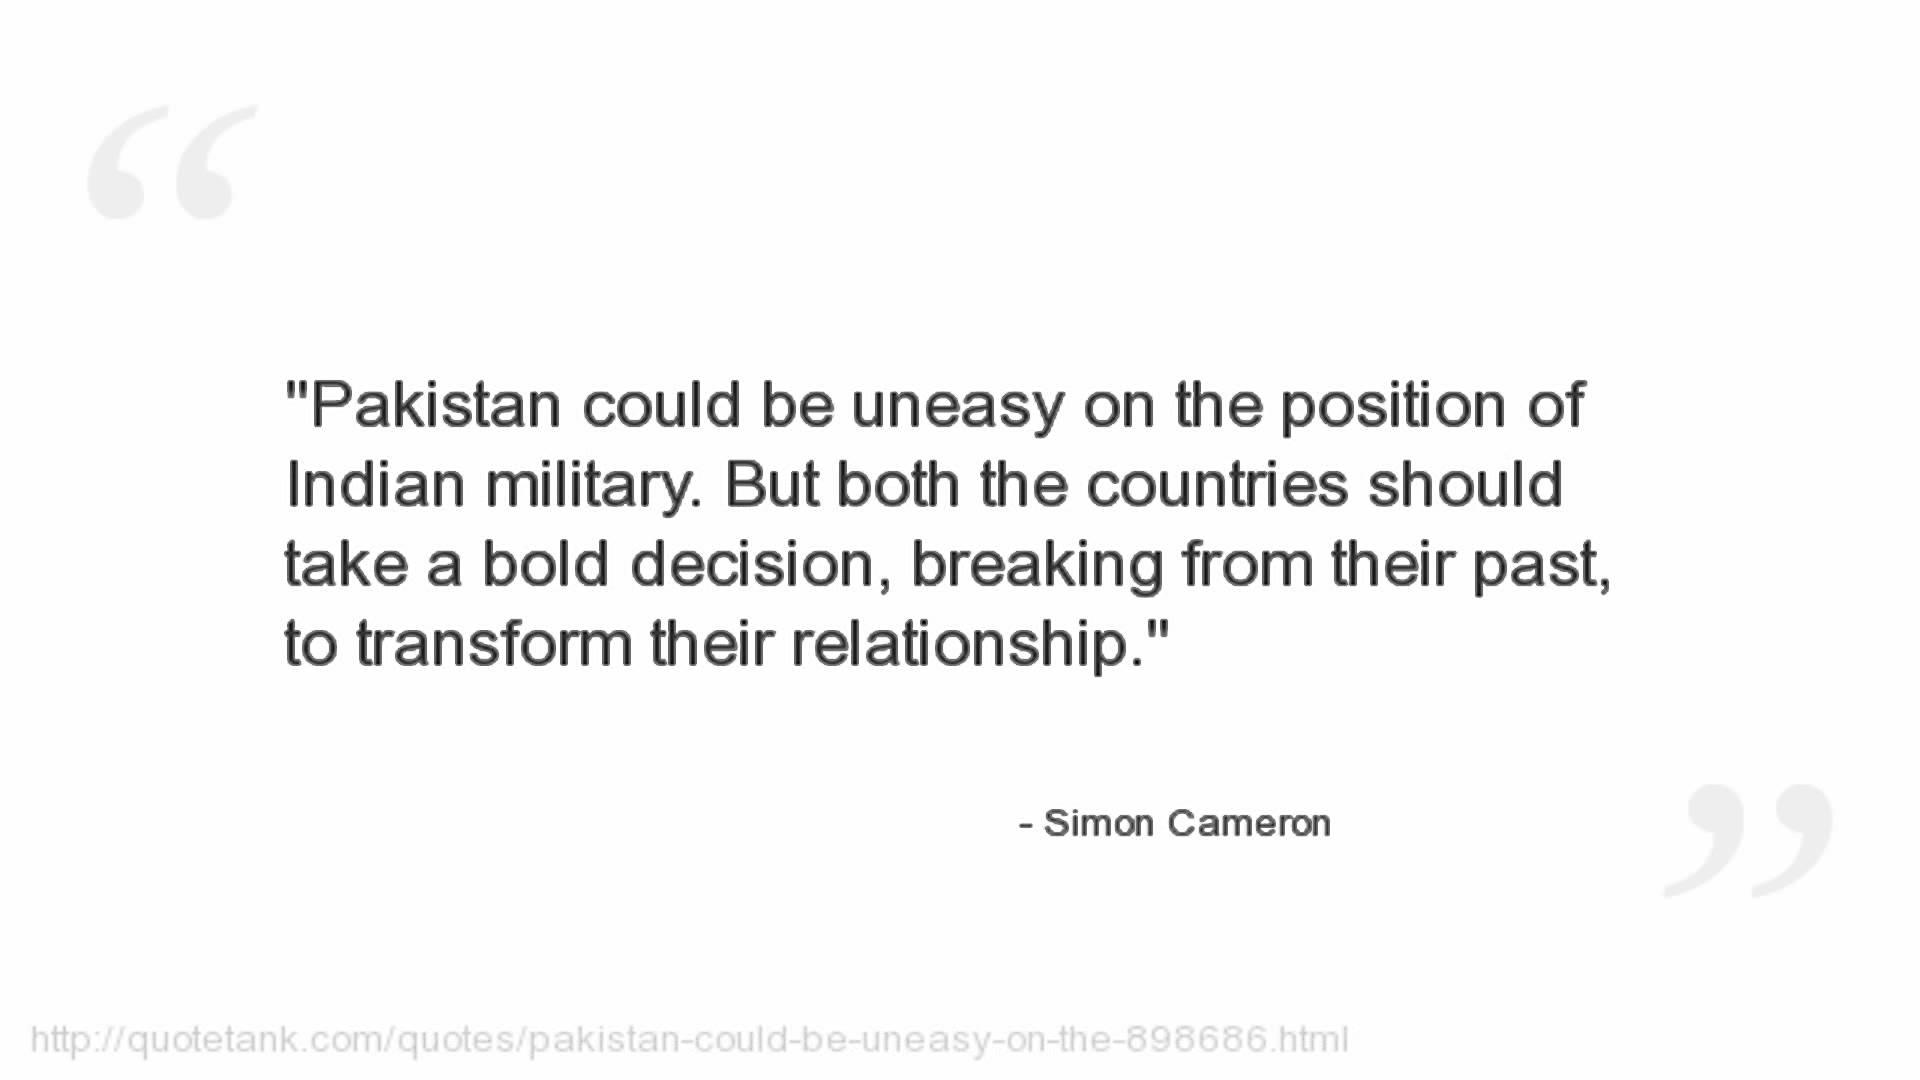 Simon Cameron's quote